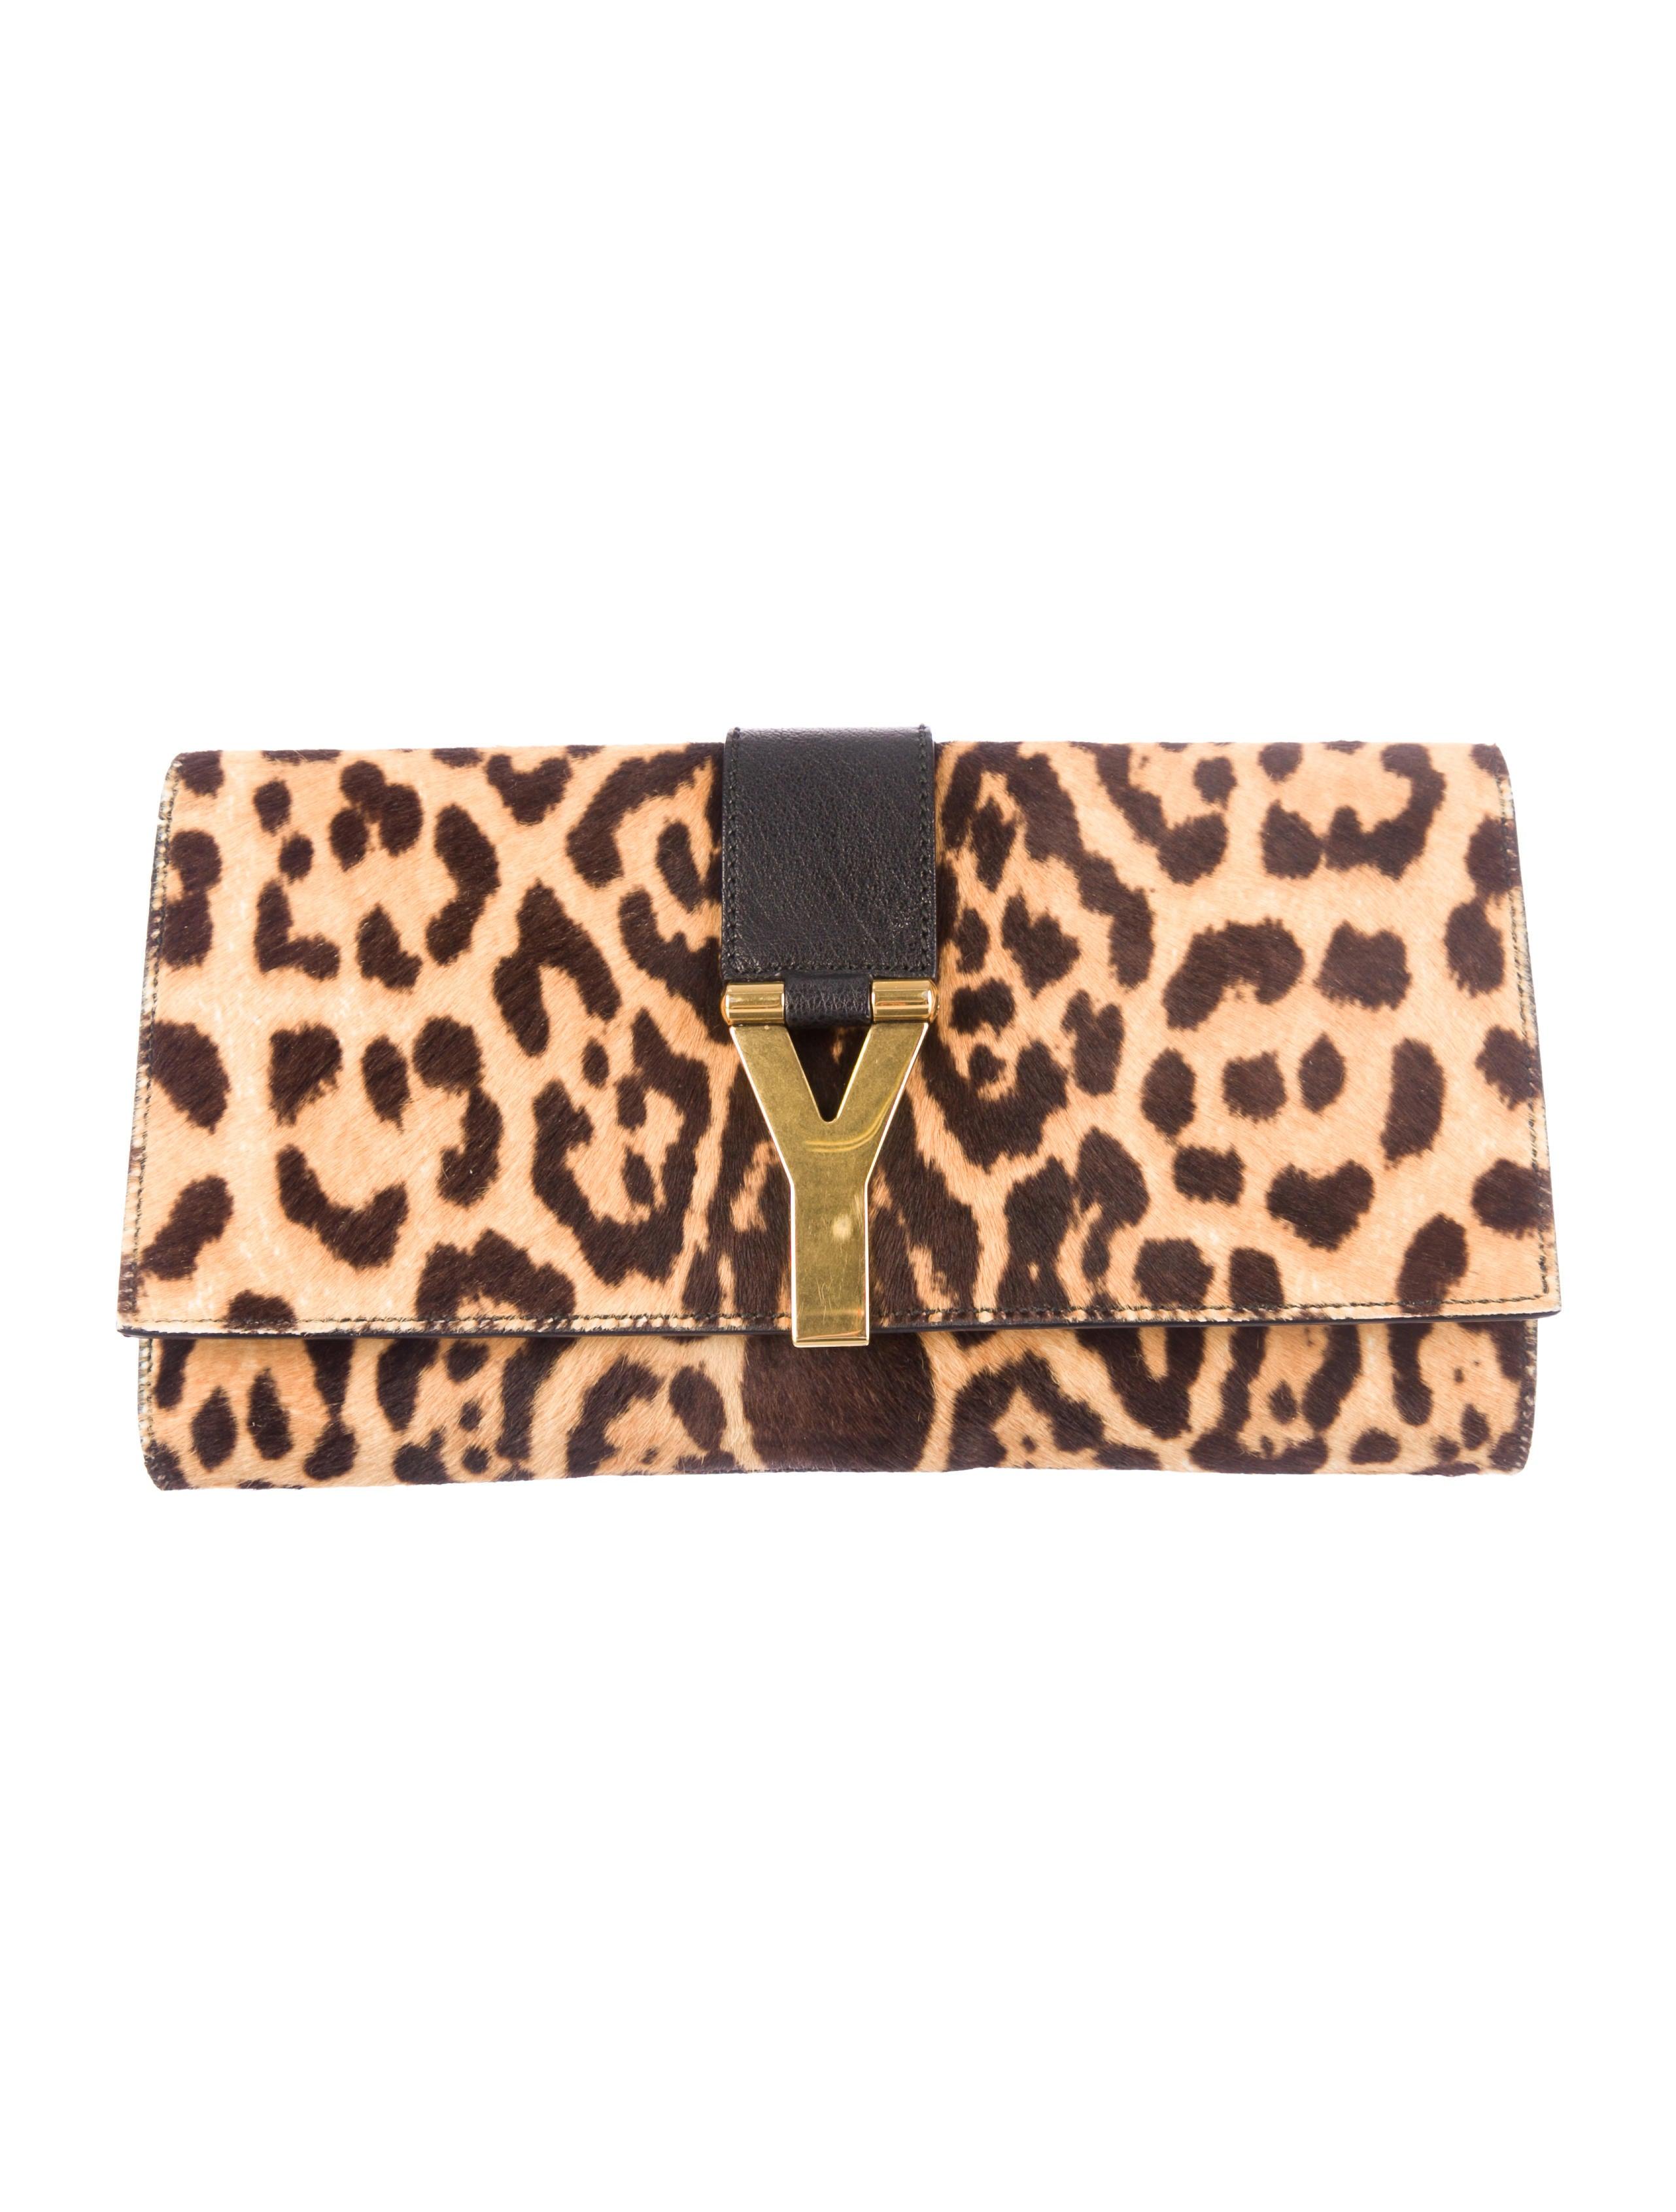 Yves Saint Laurent Chyc Clutch - Handbags - YVE33716 | The RealReal